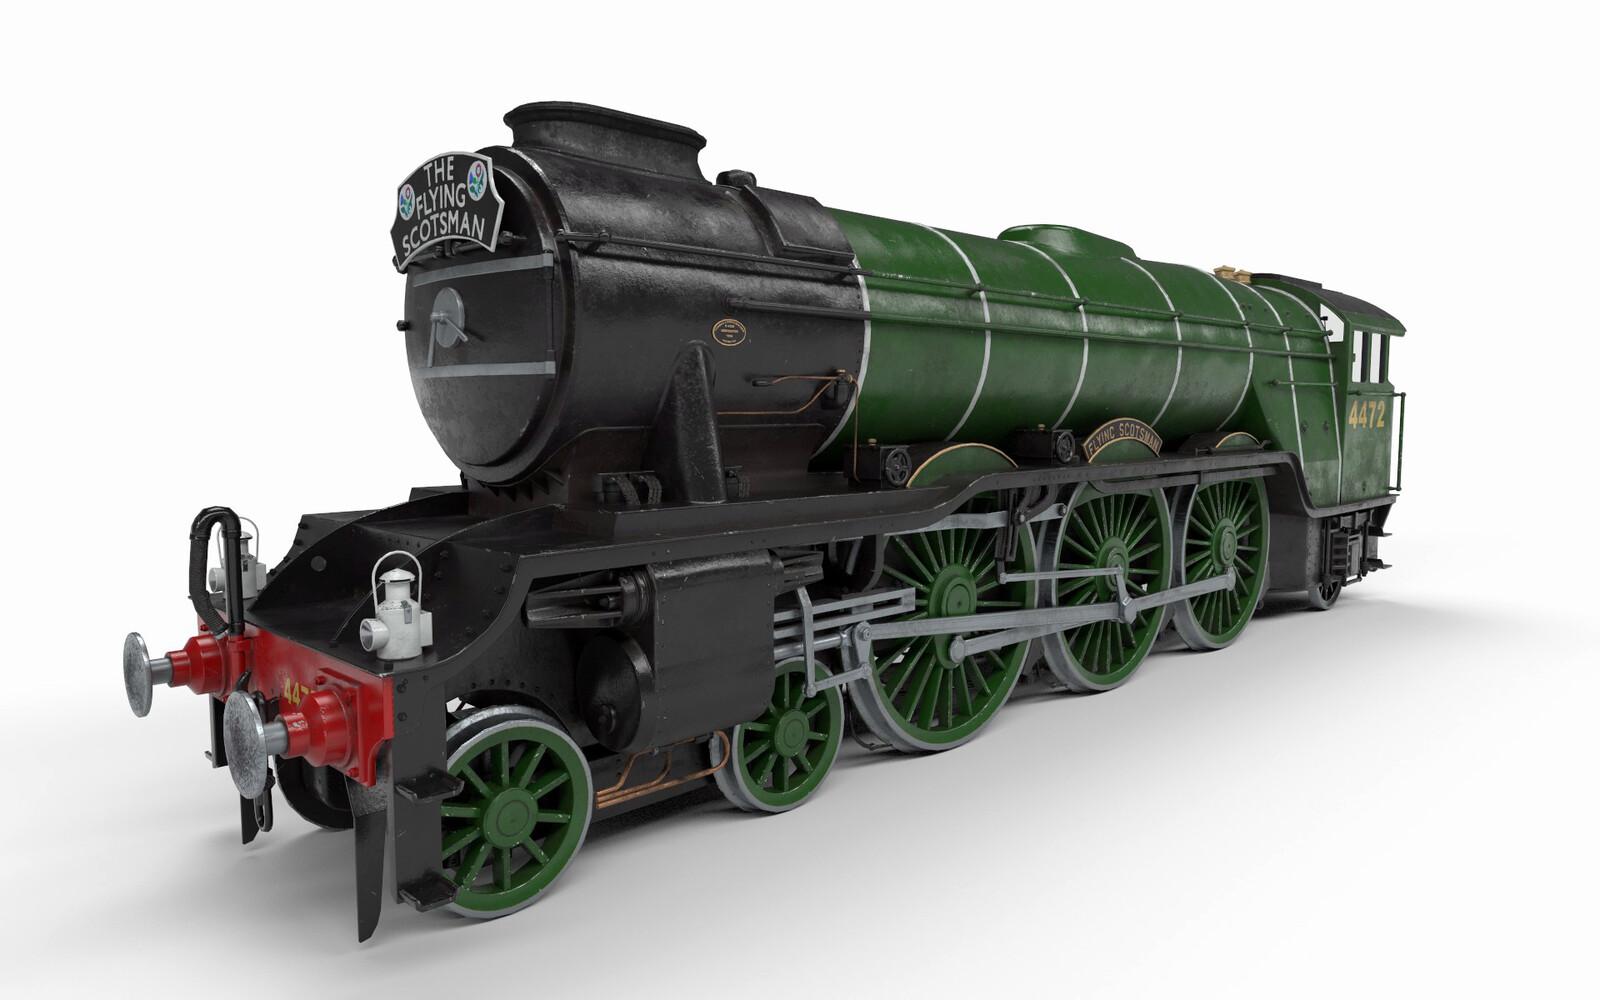 Flying Scotsman (historical train)